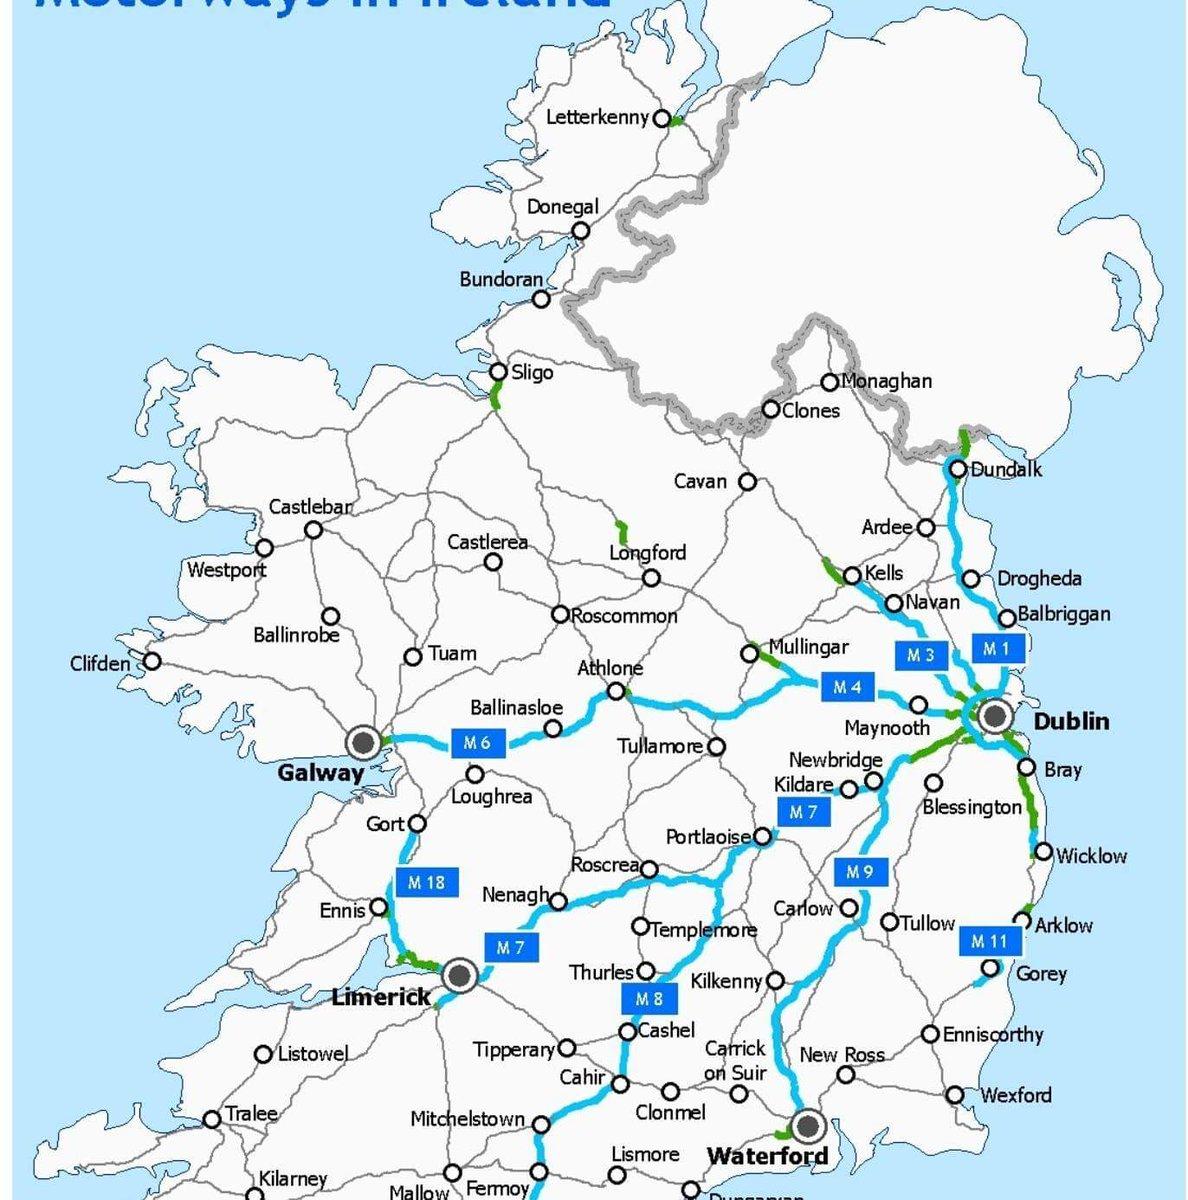 Letterkenny Ireland Map.What S On Letterkenny On Twitter Maps Of Ireland Highlighting The